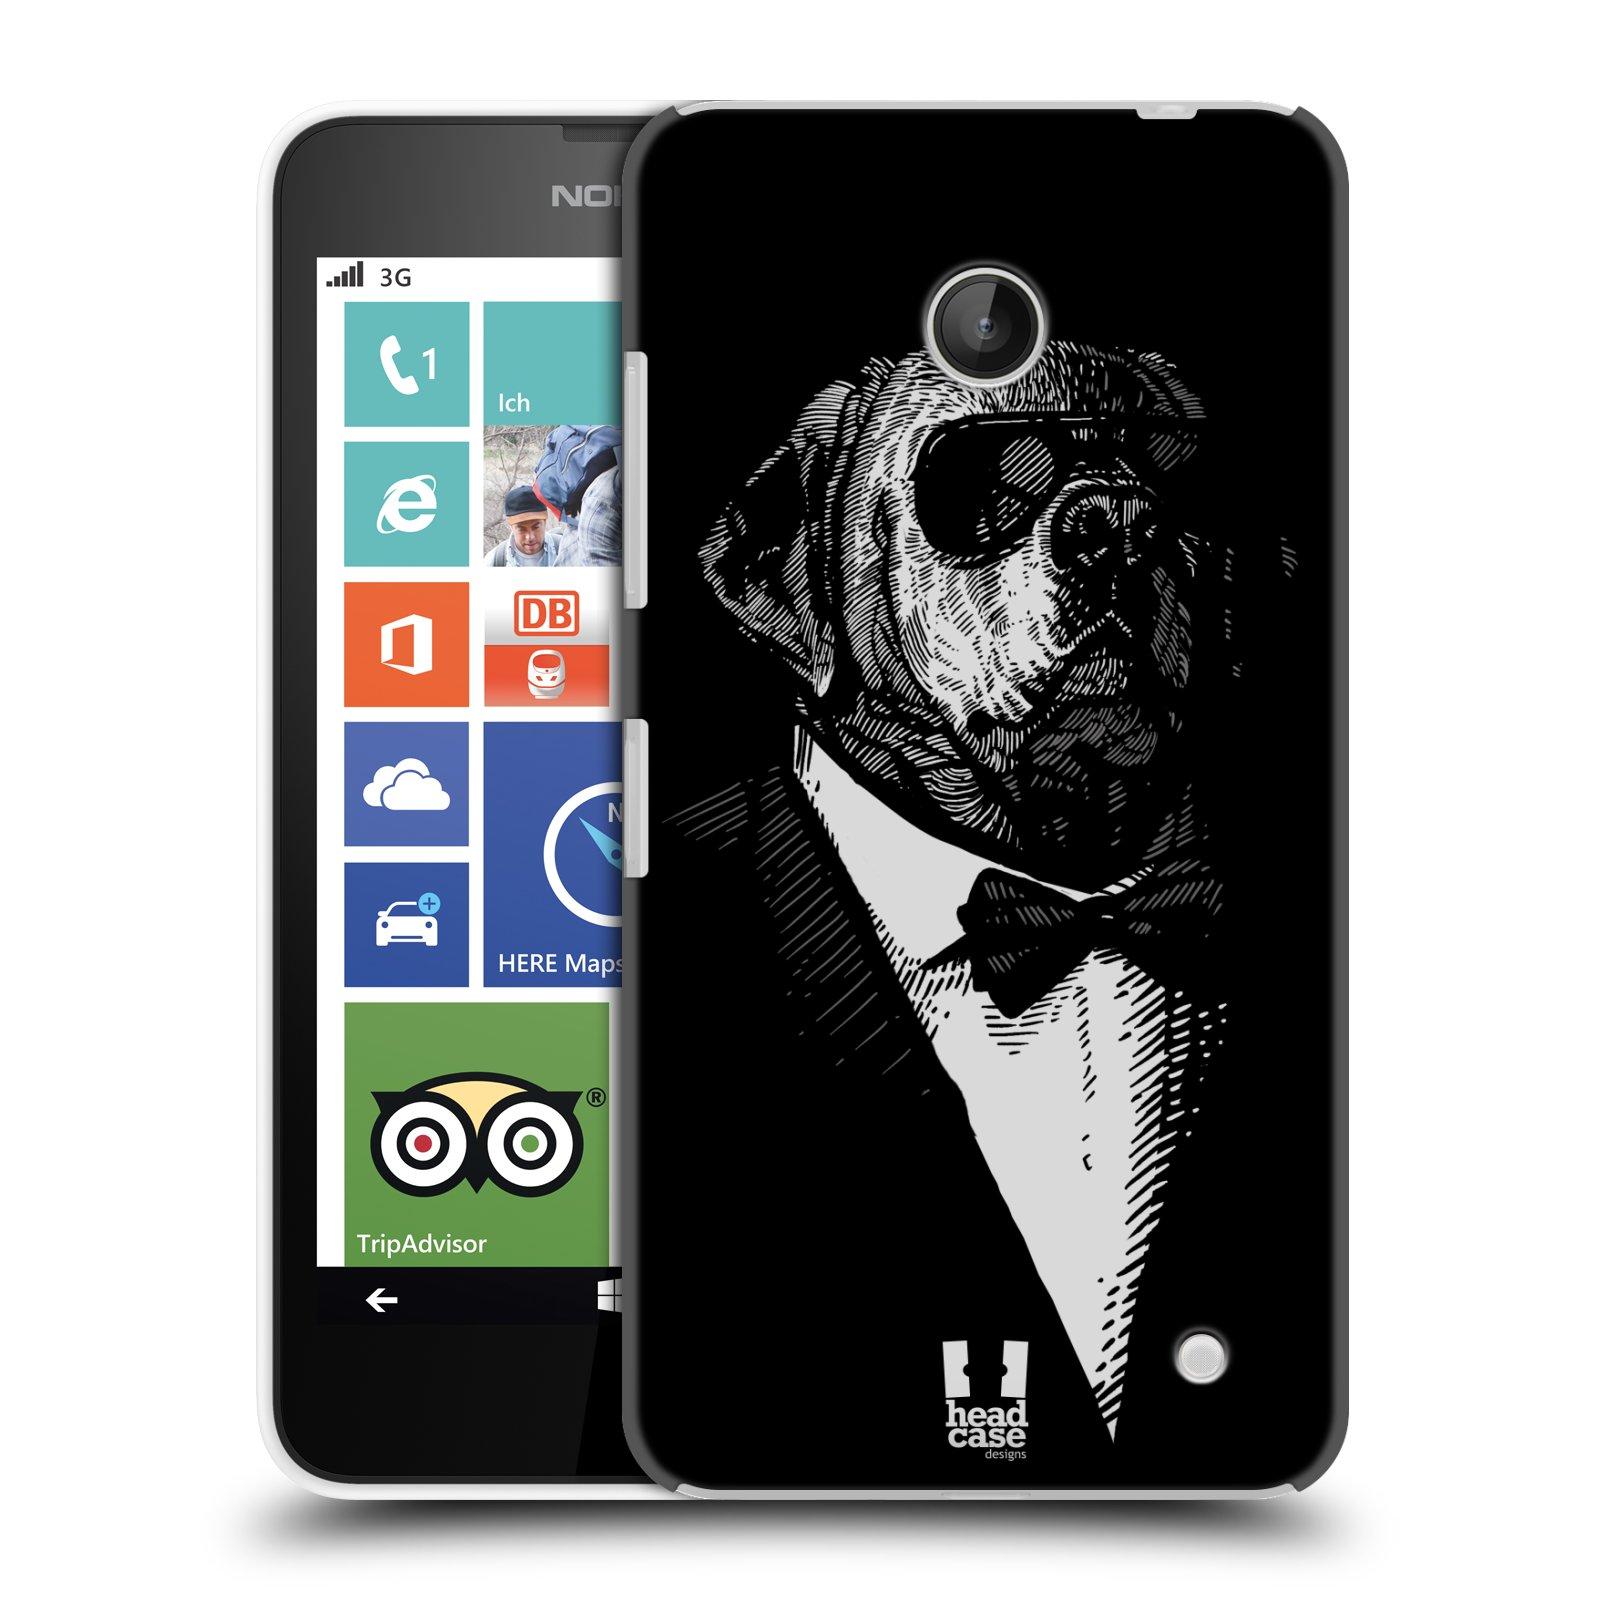 Plastové pouzdro na mobil Nokia Lumia 630 HEAD CASE PSISKO V KVÁDRU (Kryt či obal na mobilní telefon Nokia Lumia 630 a Nokia Lumia 630 Dual SIM)